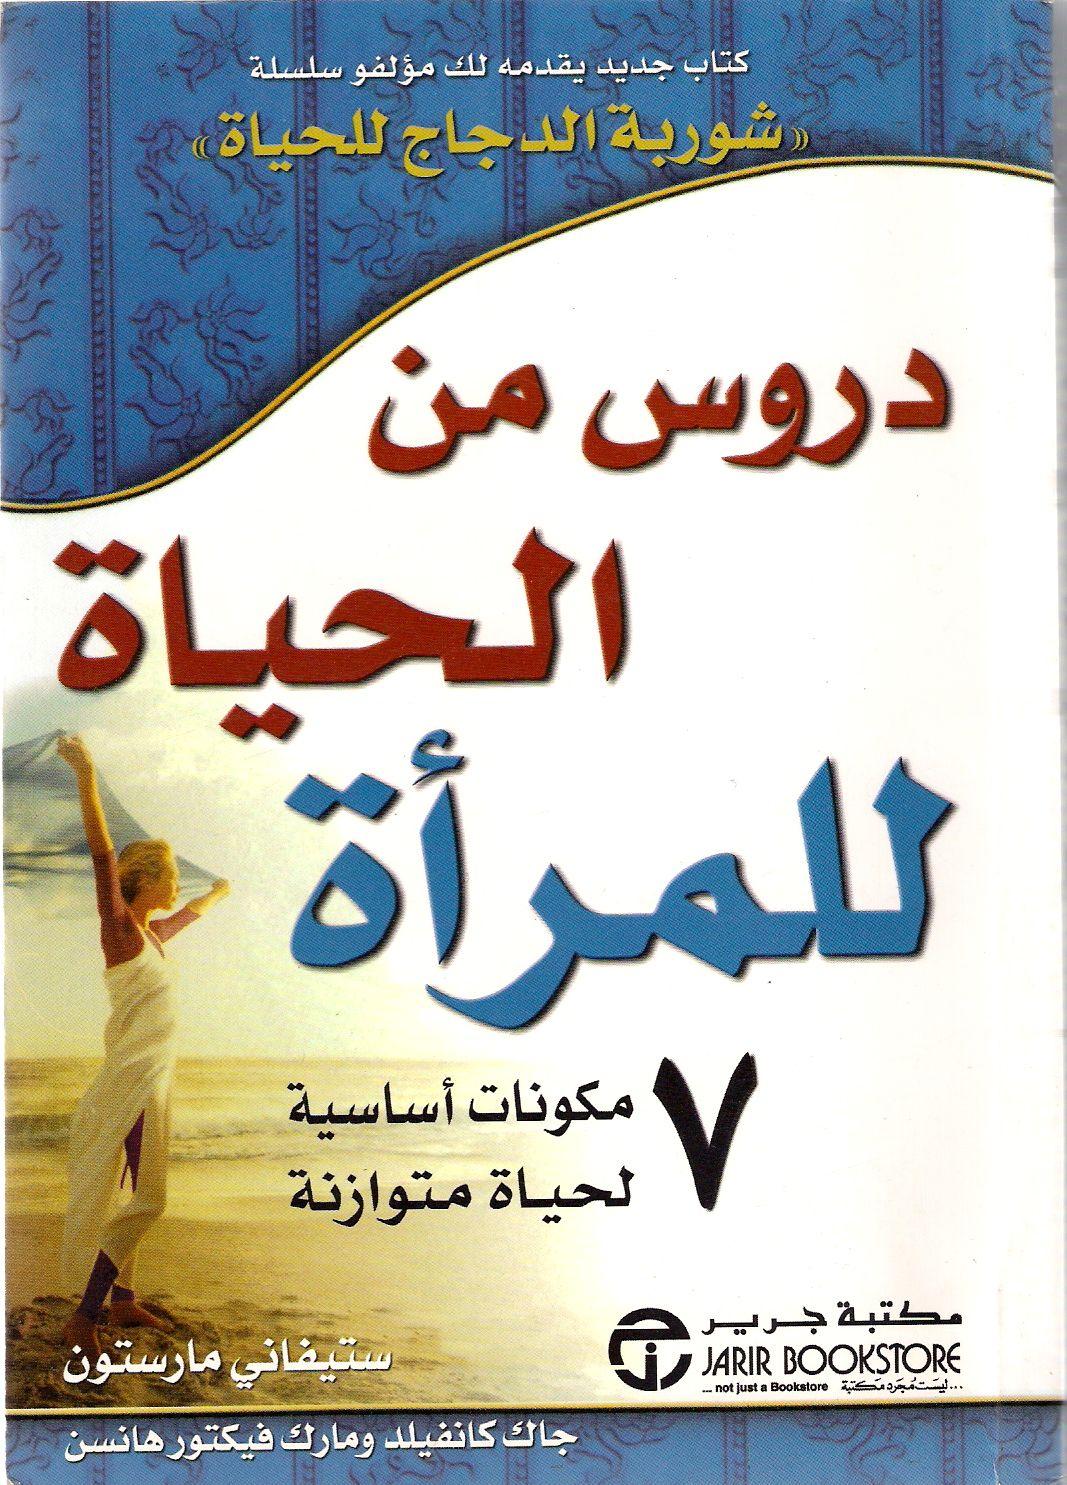 دروس من الحياة للمرأة Book Club Books Ebooks Free Books Pdf Books Reading